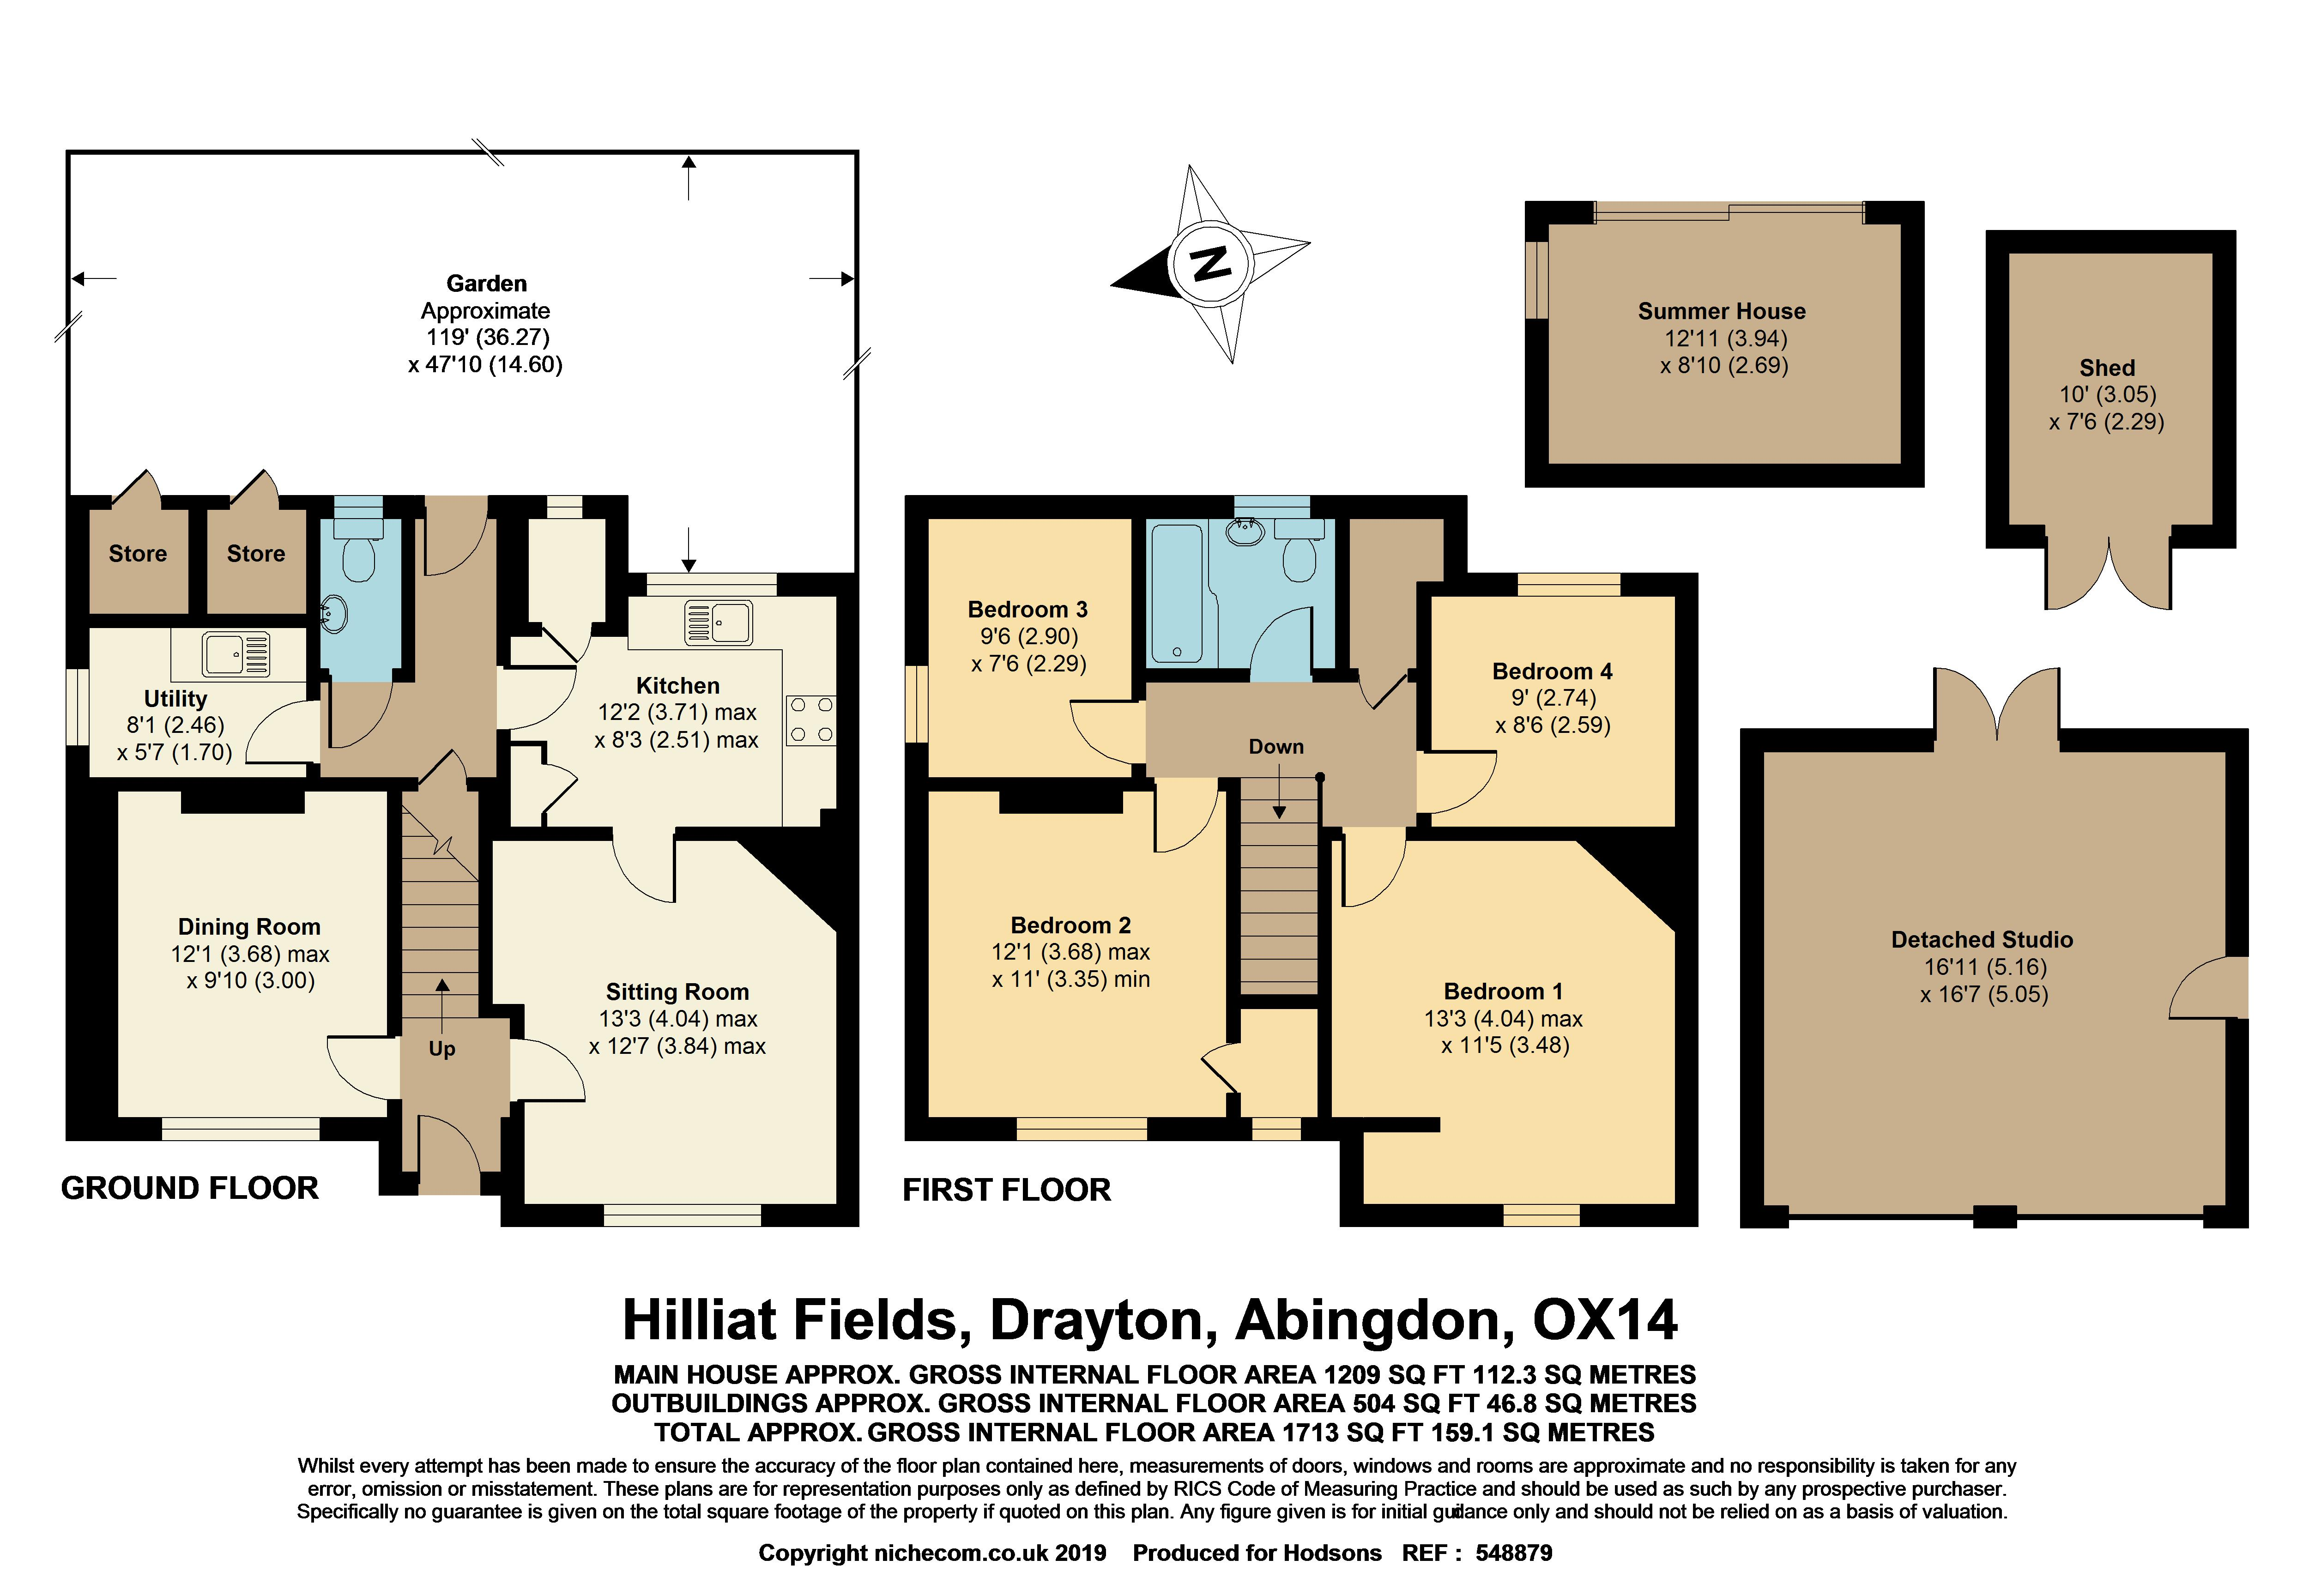 Hilliat Fields Drayton